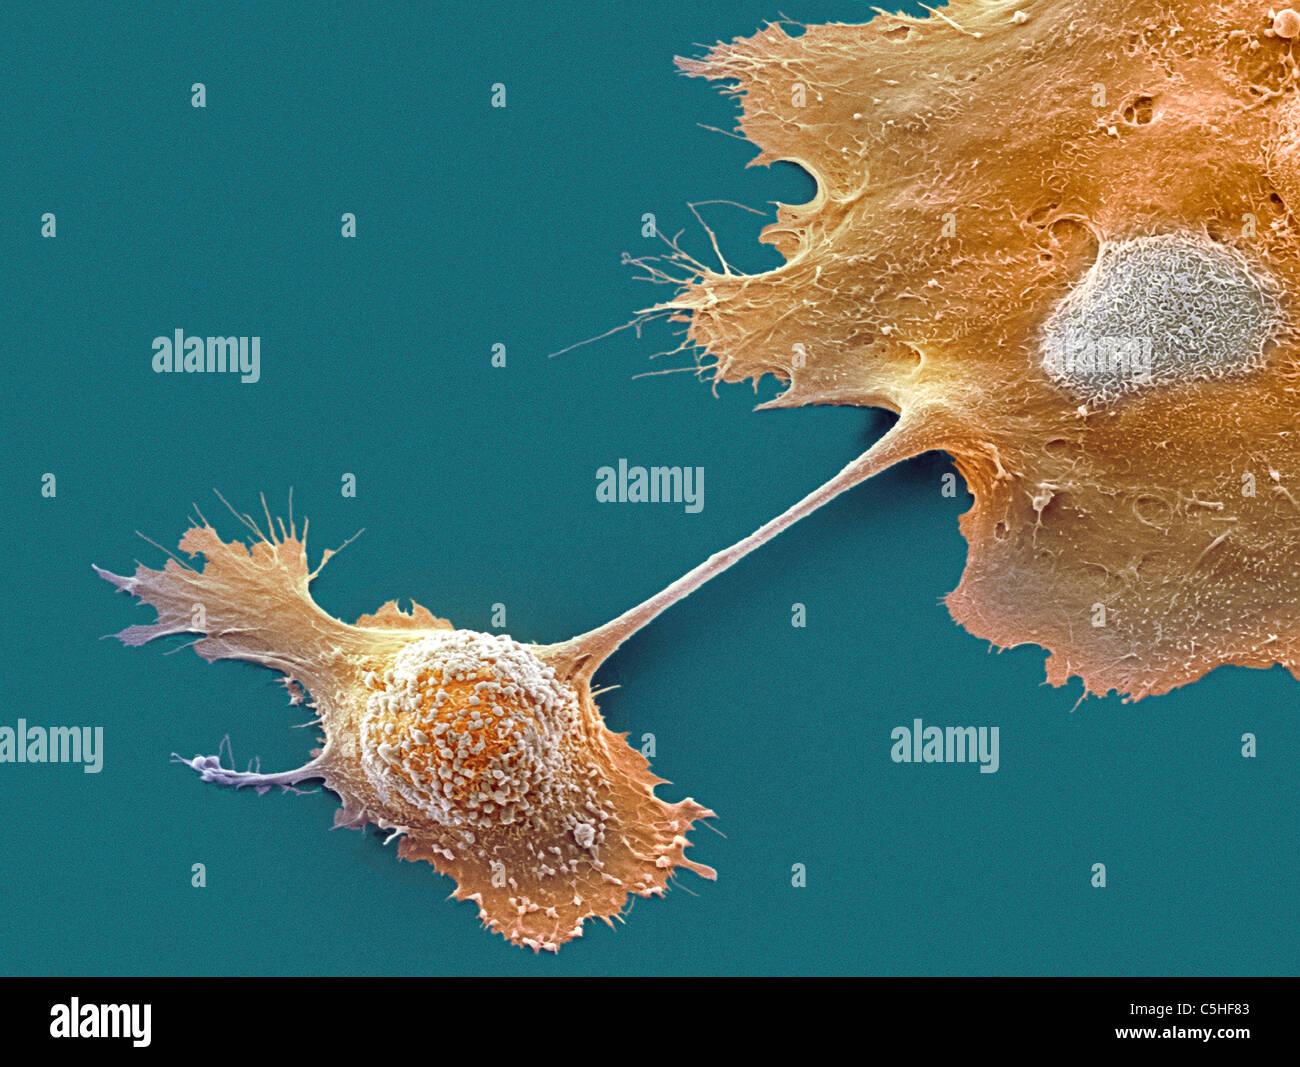 Pancreatic cancer cells, SEM - Stock Image